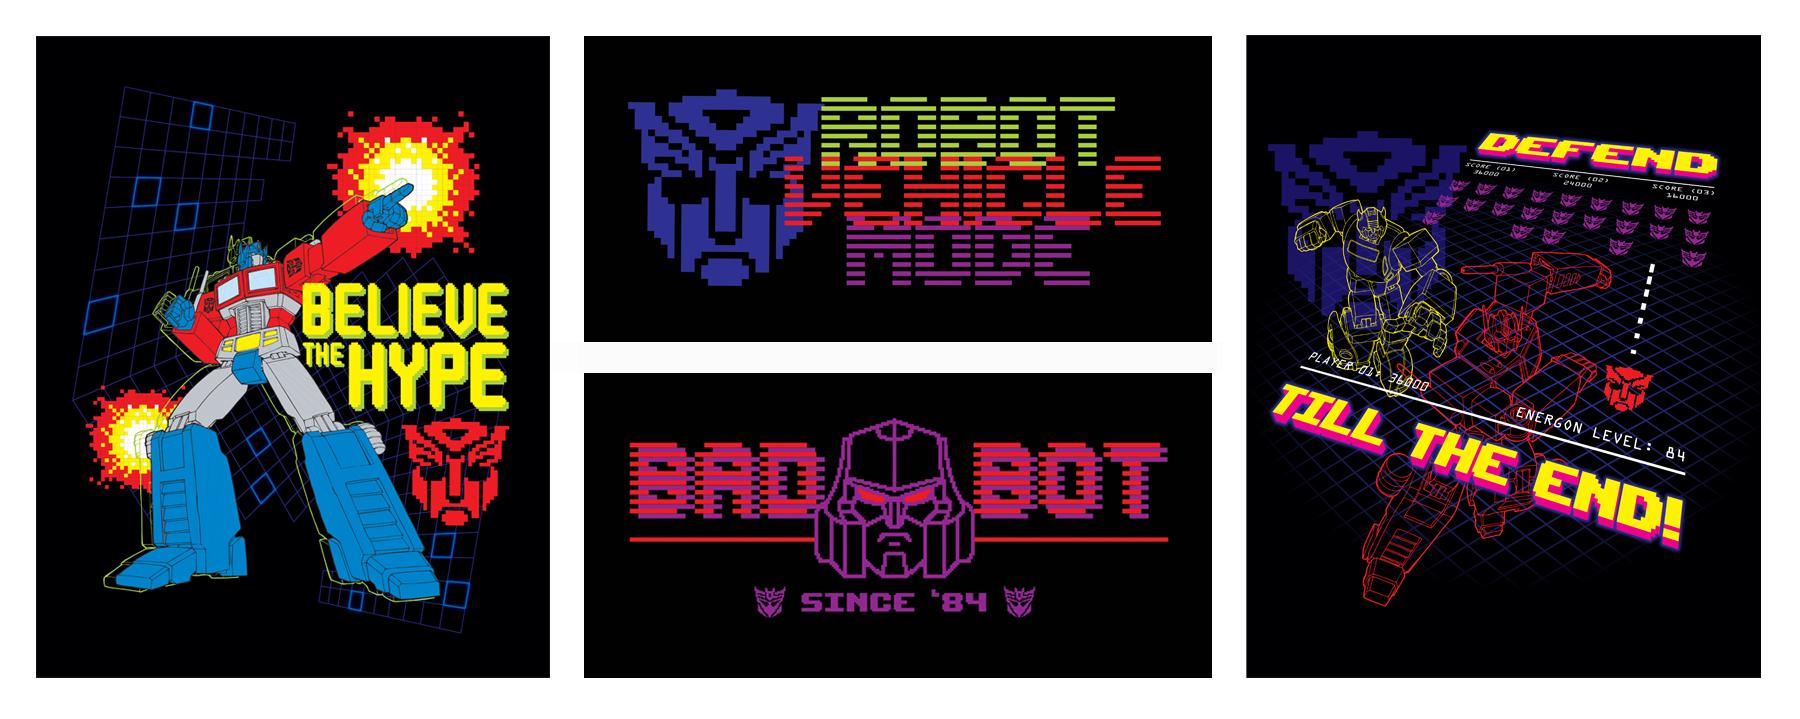 TF Gen 1: 1984 Arcade Style Guide Design - ID 6